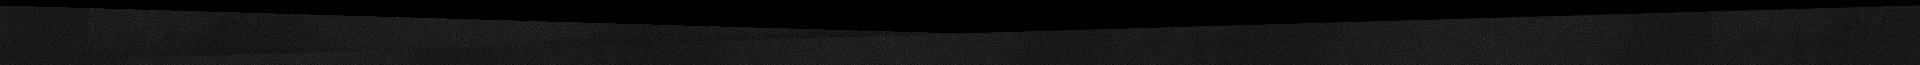 Horizonal line image